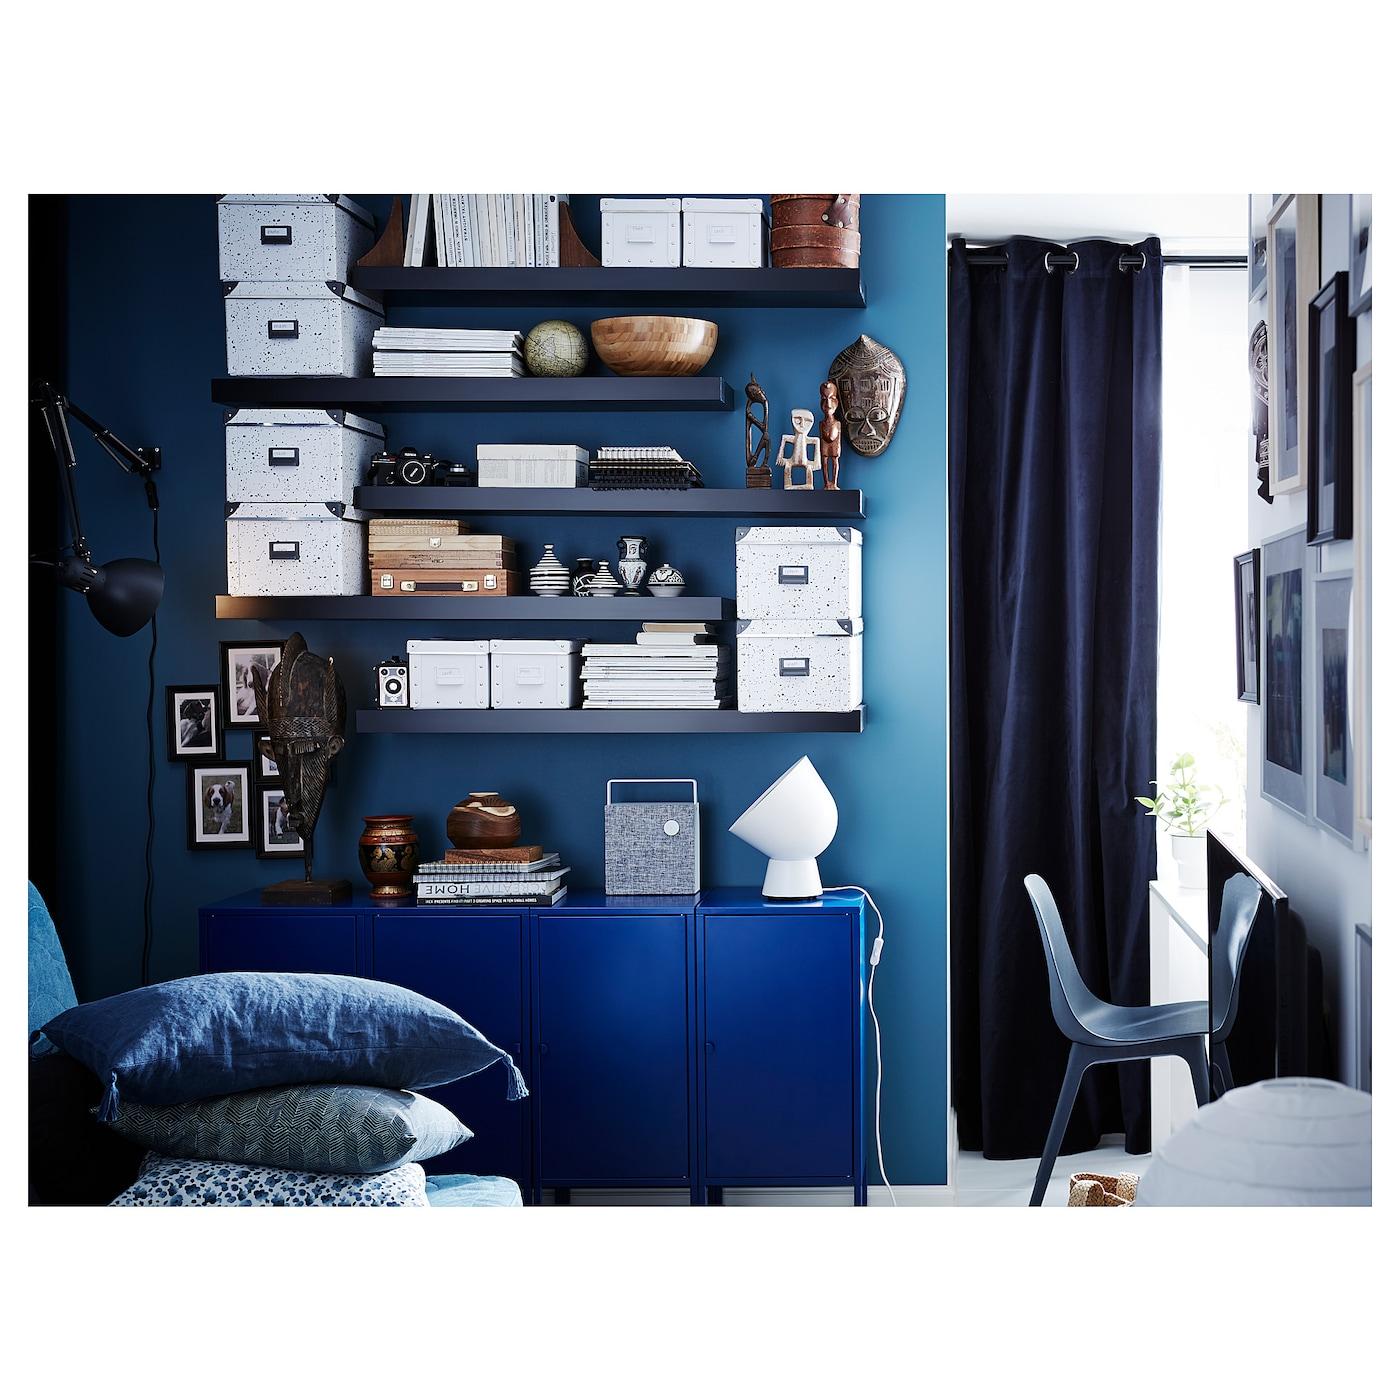 Lack Wall Shelf Black Brown 43 1 4x10 1 4 Ikea